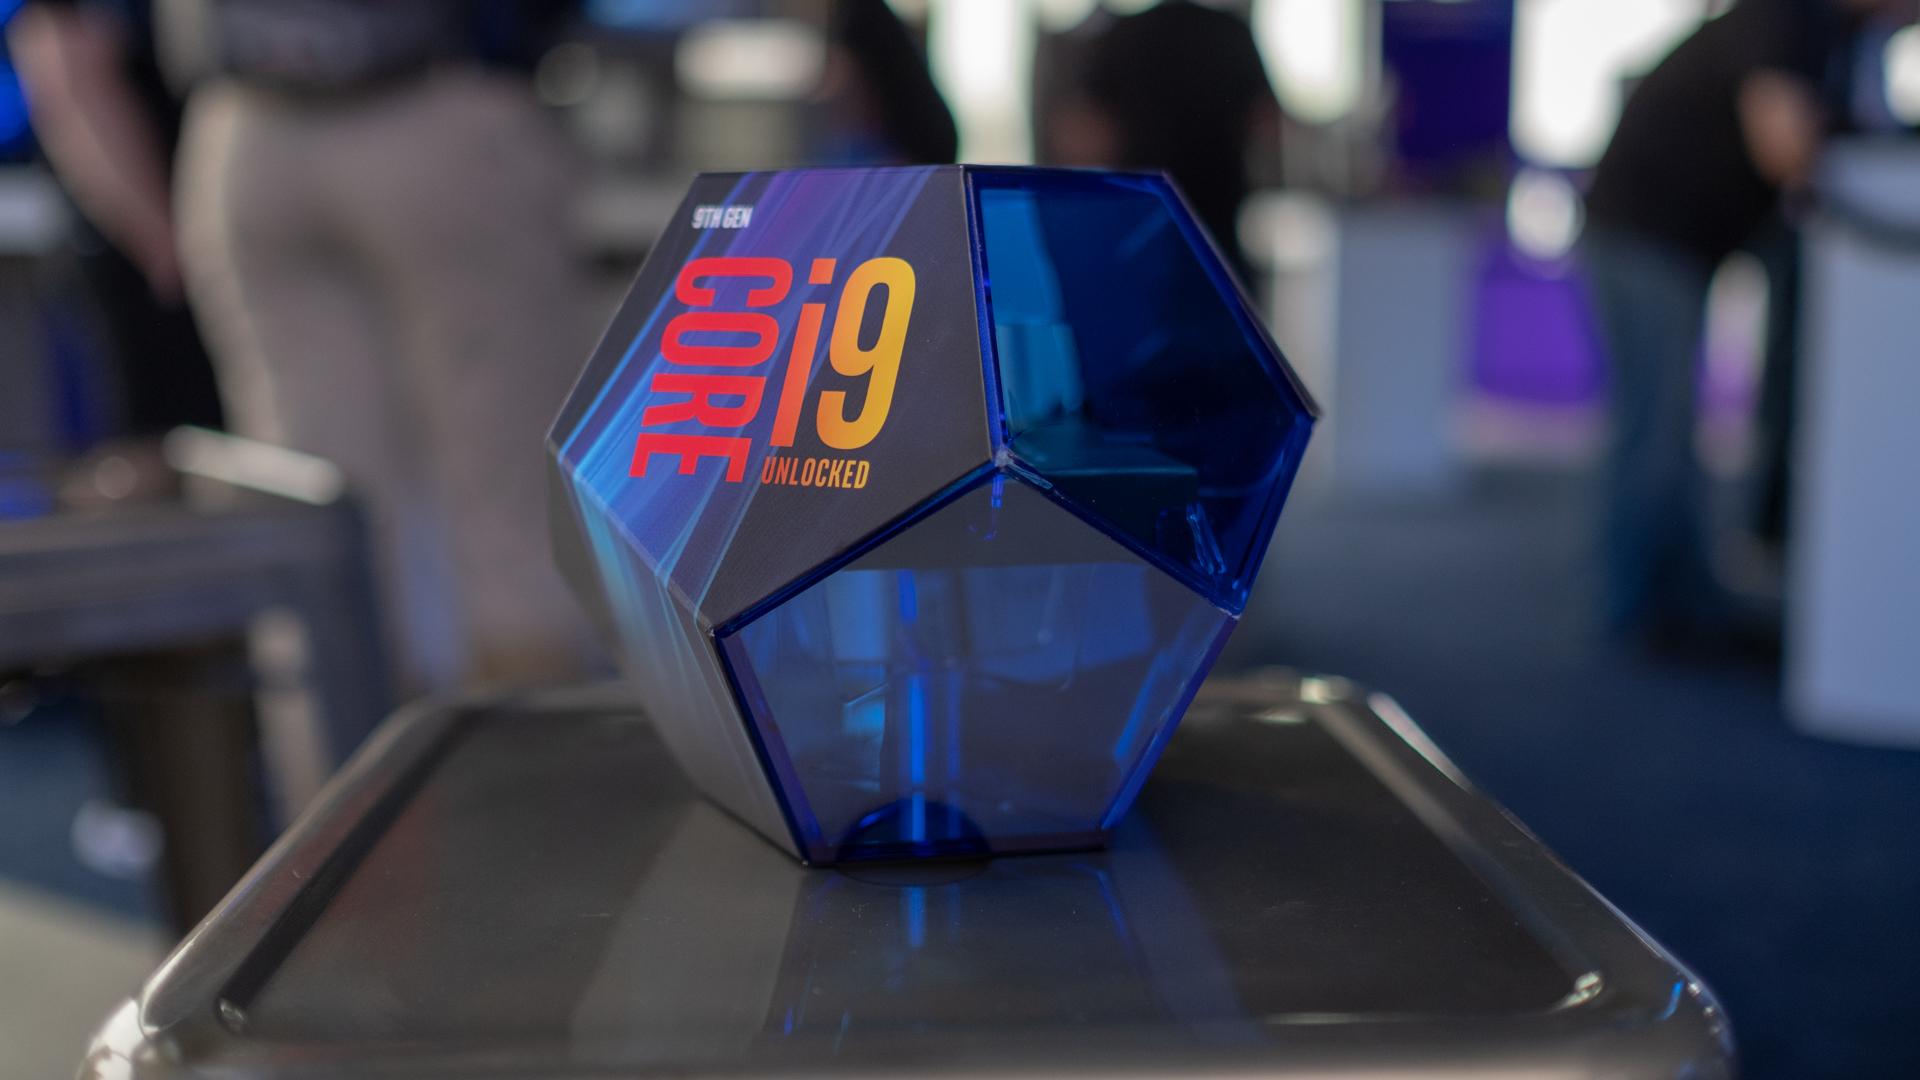 Leak suggests Intel 10-core Comet Lake CPU could beat AMD